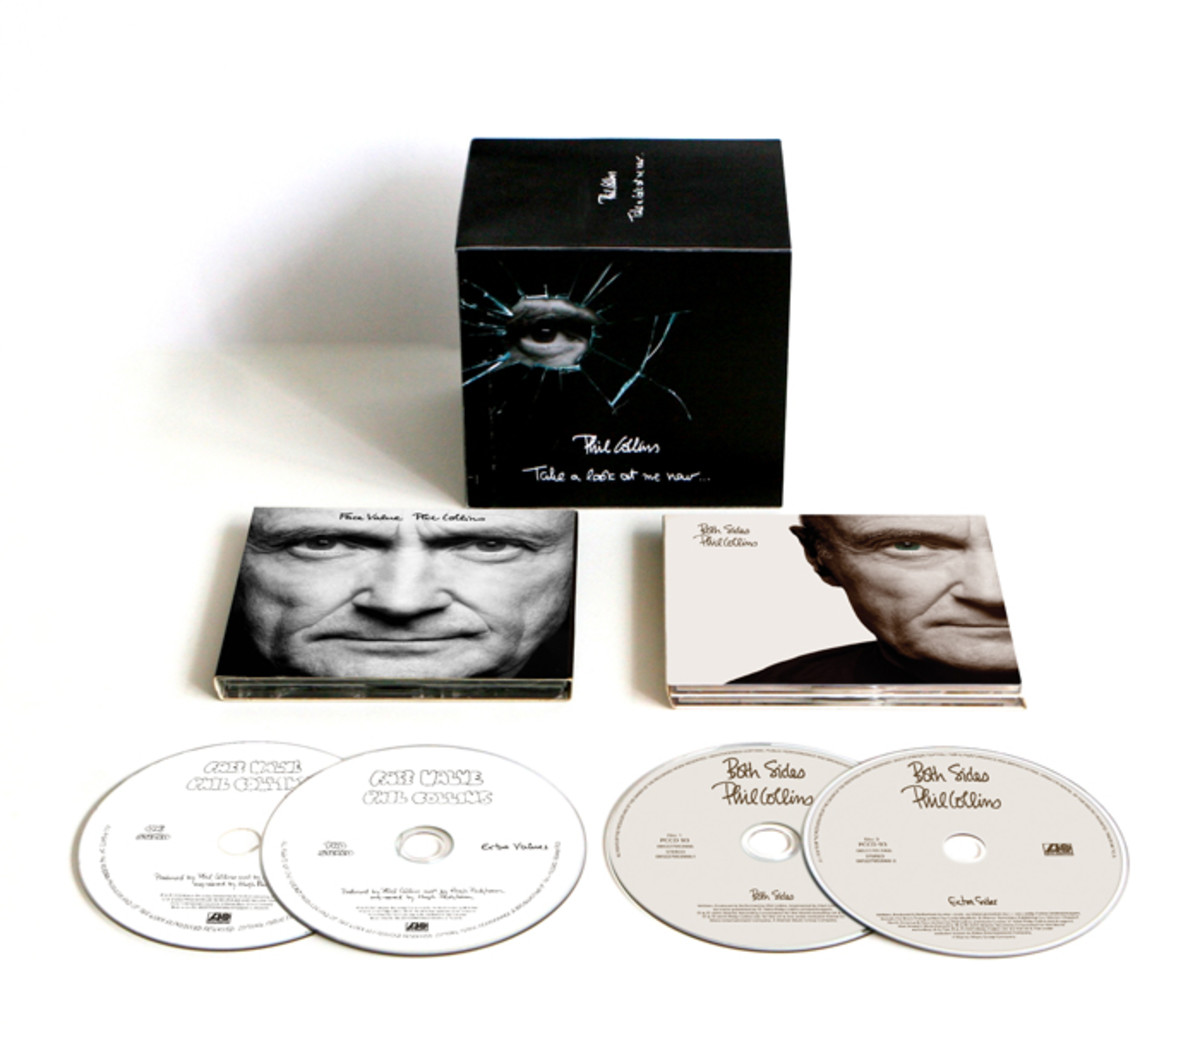 Phil Collins - CD Boxset